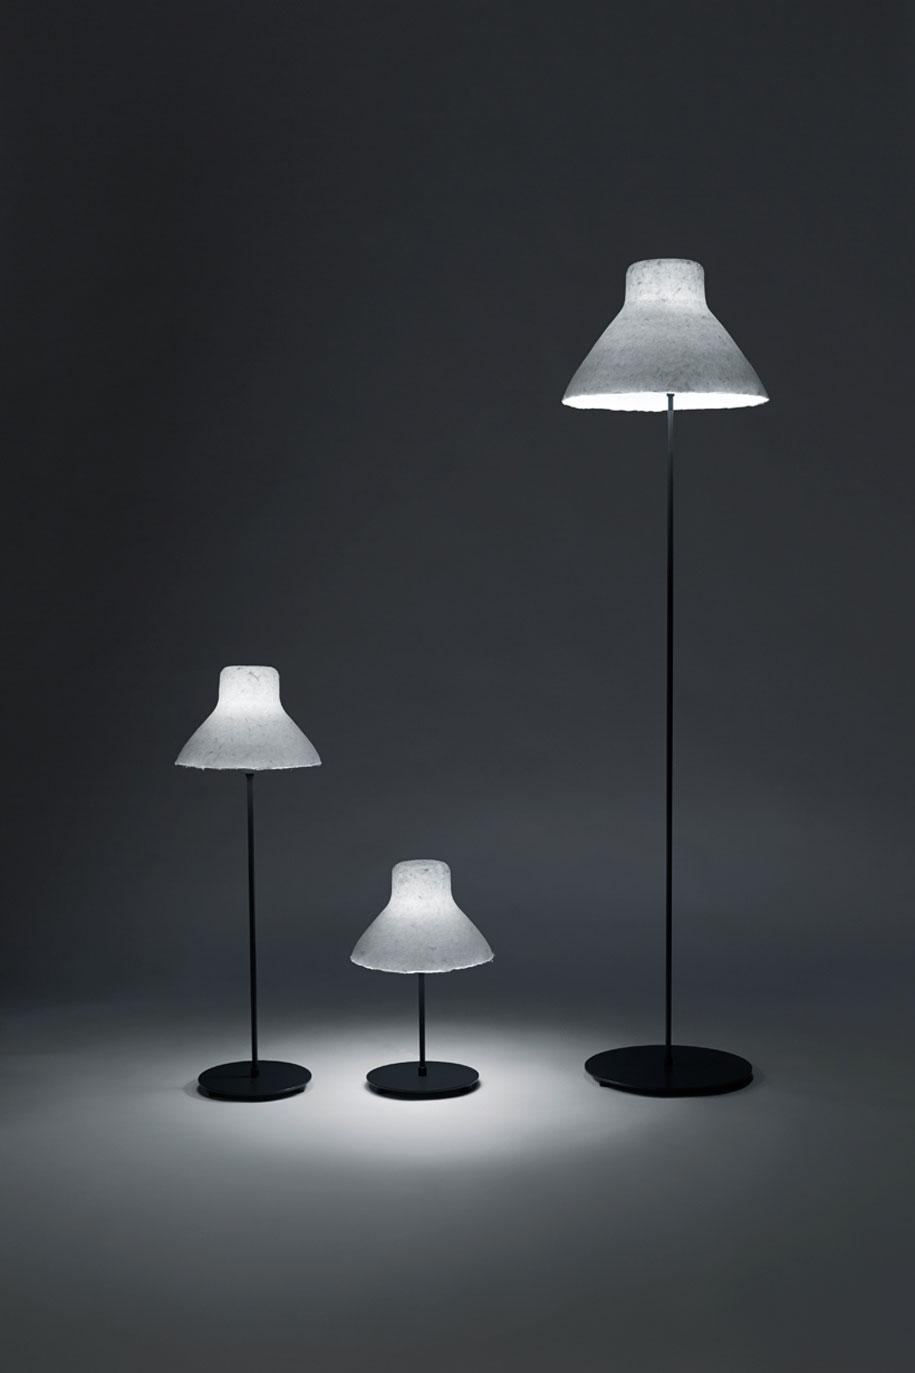 Nendo-Lamp-Akihiro-Yoshida-Habitus-Living-04